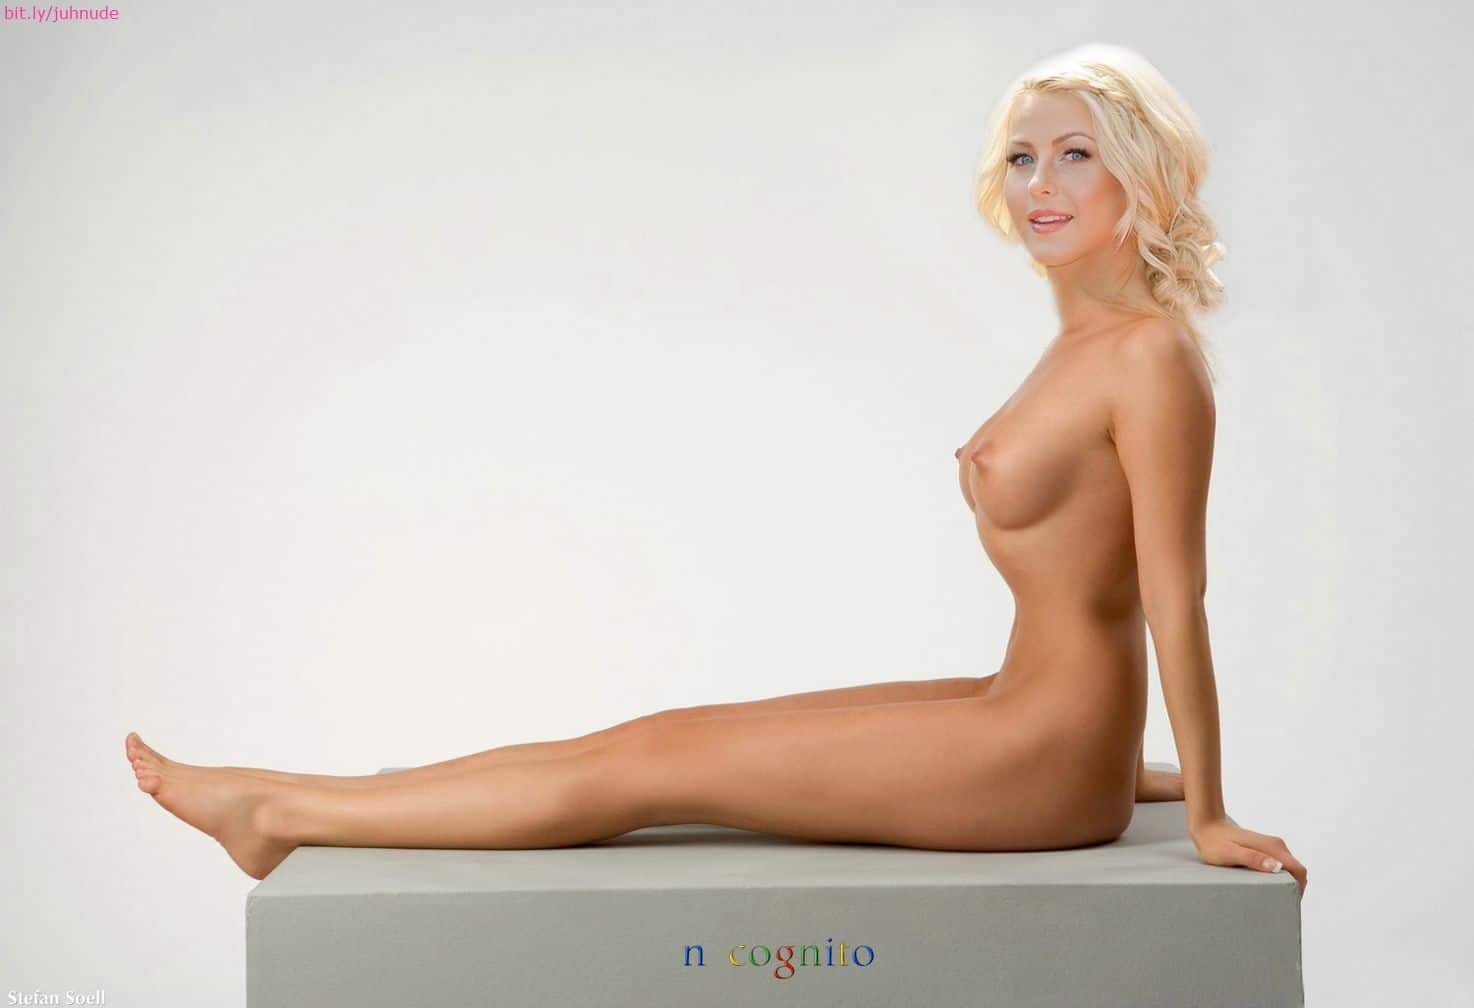 Chanel hernandez nude